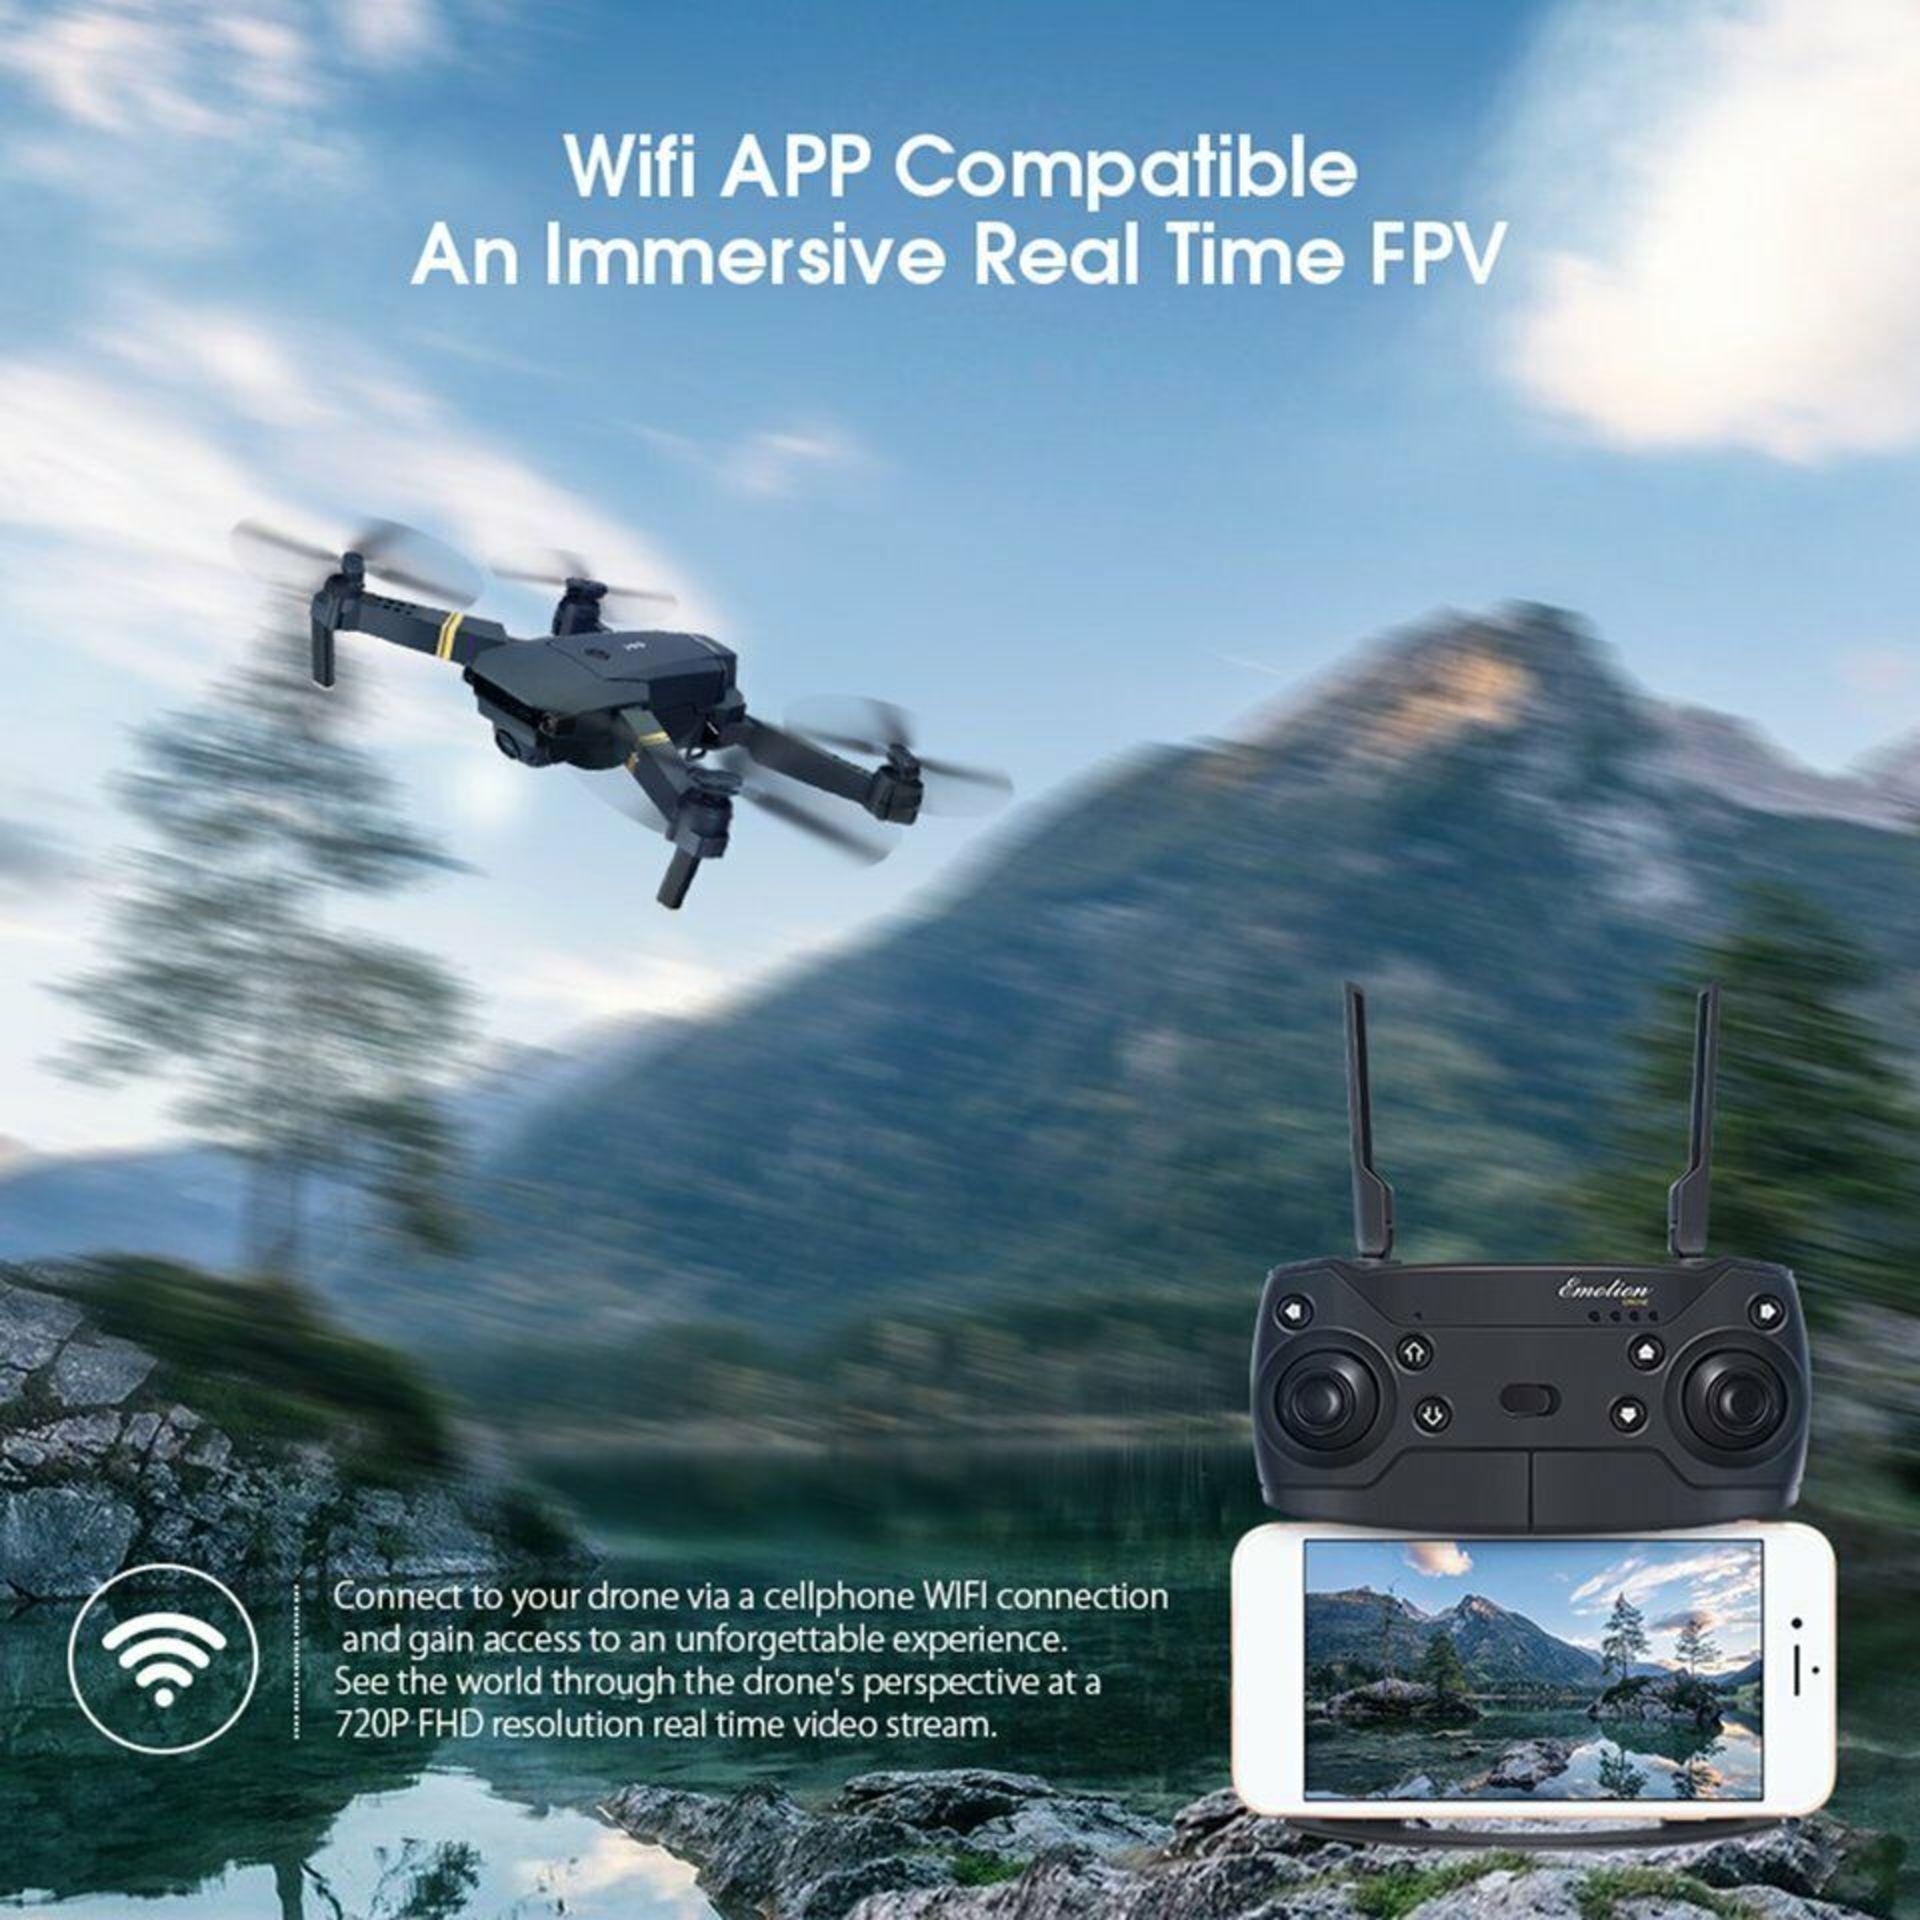 NEW & UNUSED DRONE X PRO WIFI FPV 1080P HD CAMERA FOLDABLE RC QUADCOPTER + BAG *PLUS VAT* - Image 12 of 12